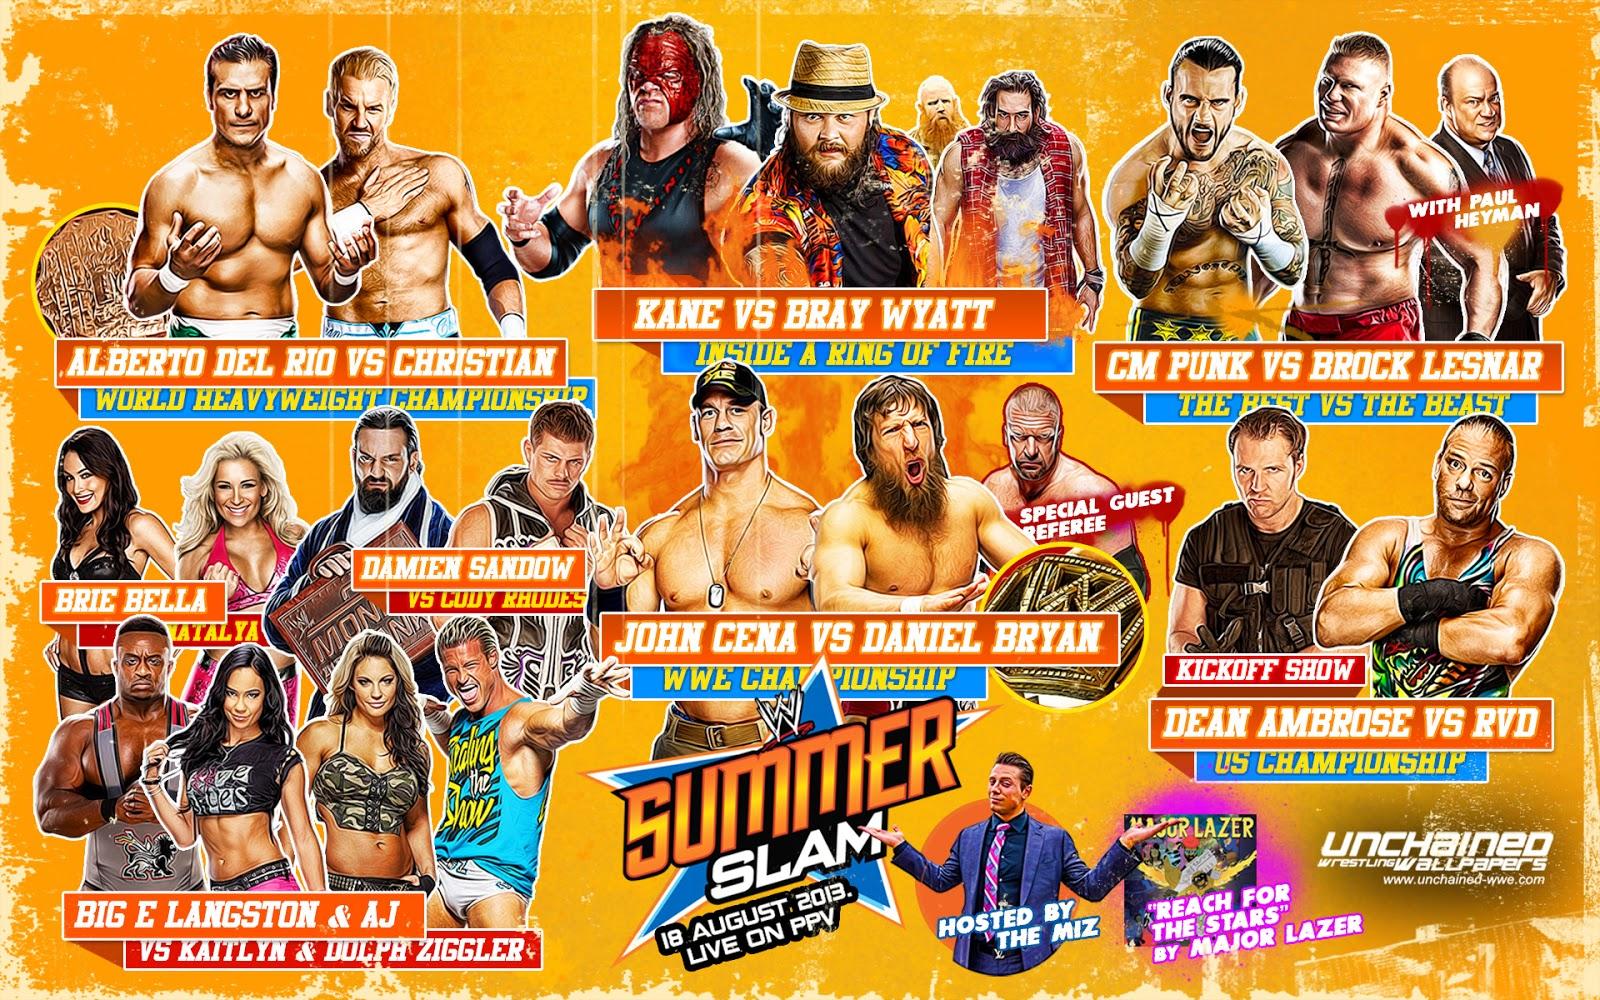 All Wwe Wrestlers 2013 Wwe summerslam 2013 reviewAll Wwe Wrestlers 2013